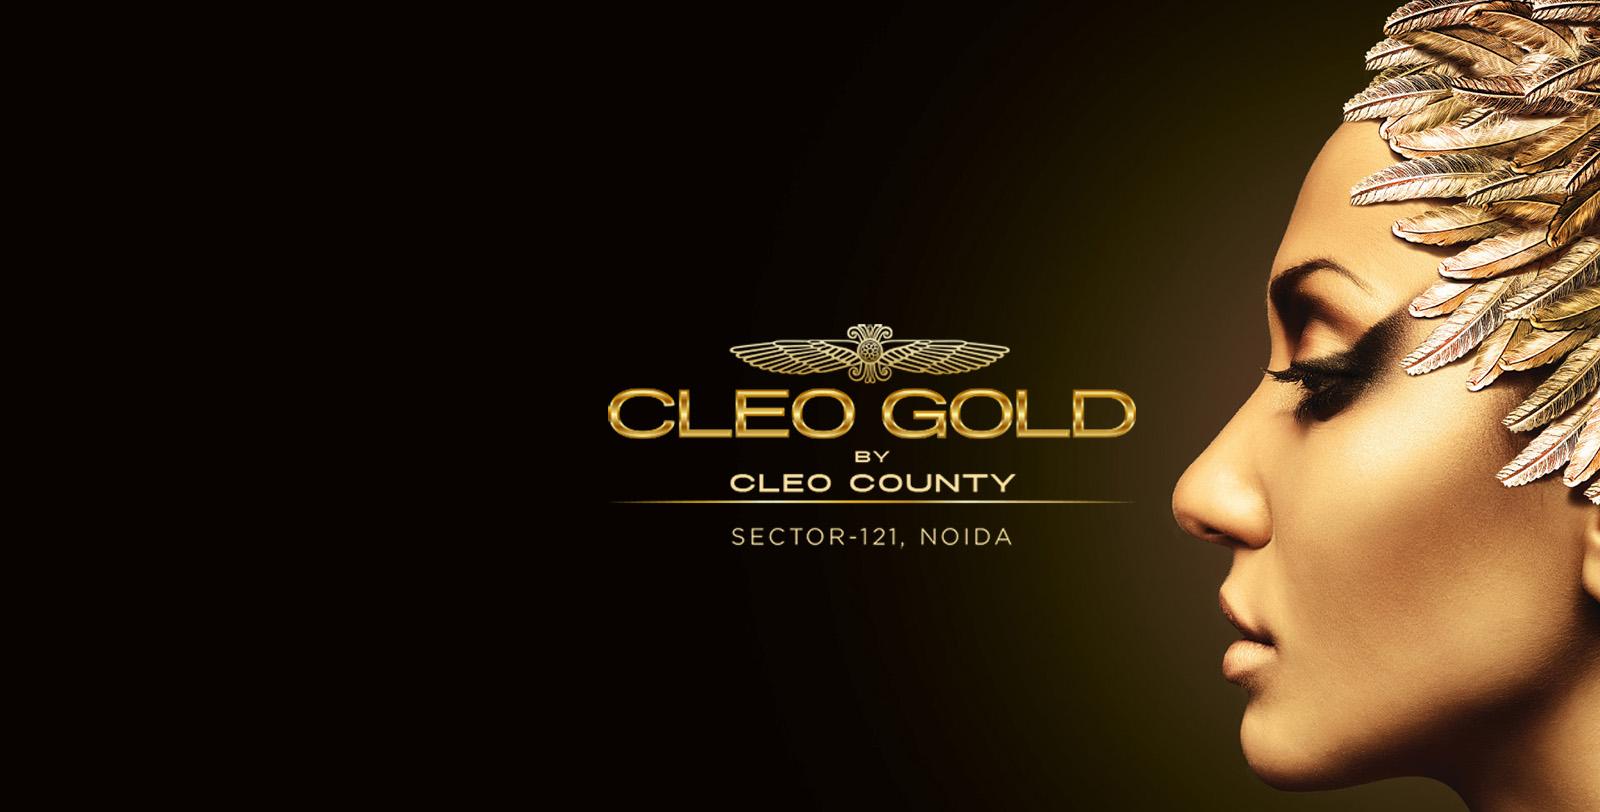 http://www.getsellproperty.com/builder/aba-corp/cleo-gold/header.jpg